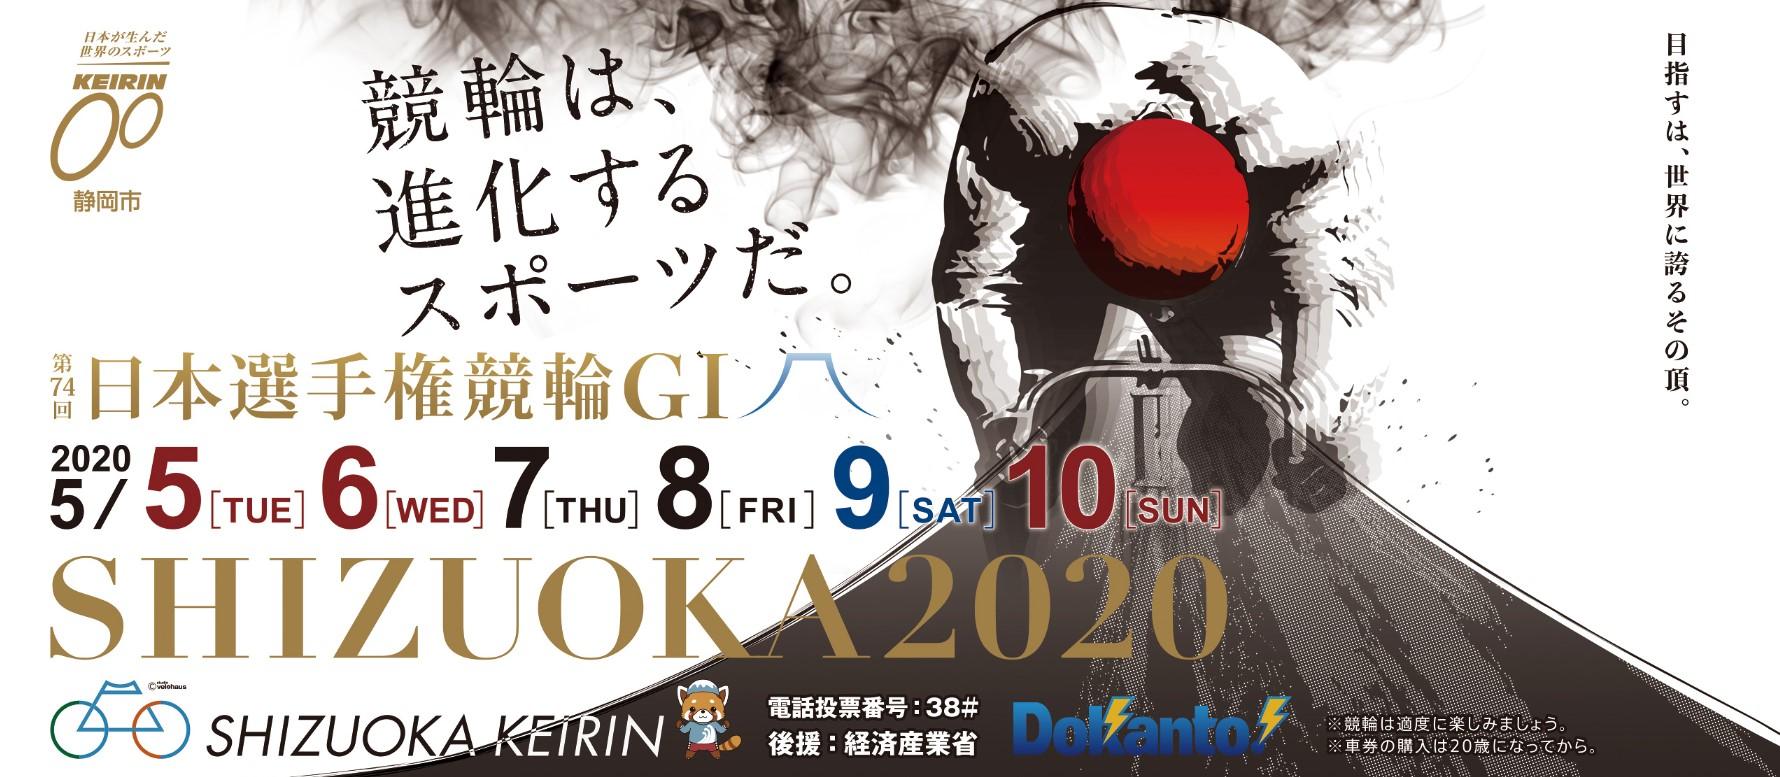 静岡競輪 日本選手権競輪(GⅠ)競輪グレードレース展望